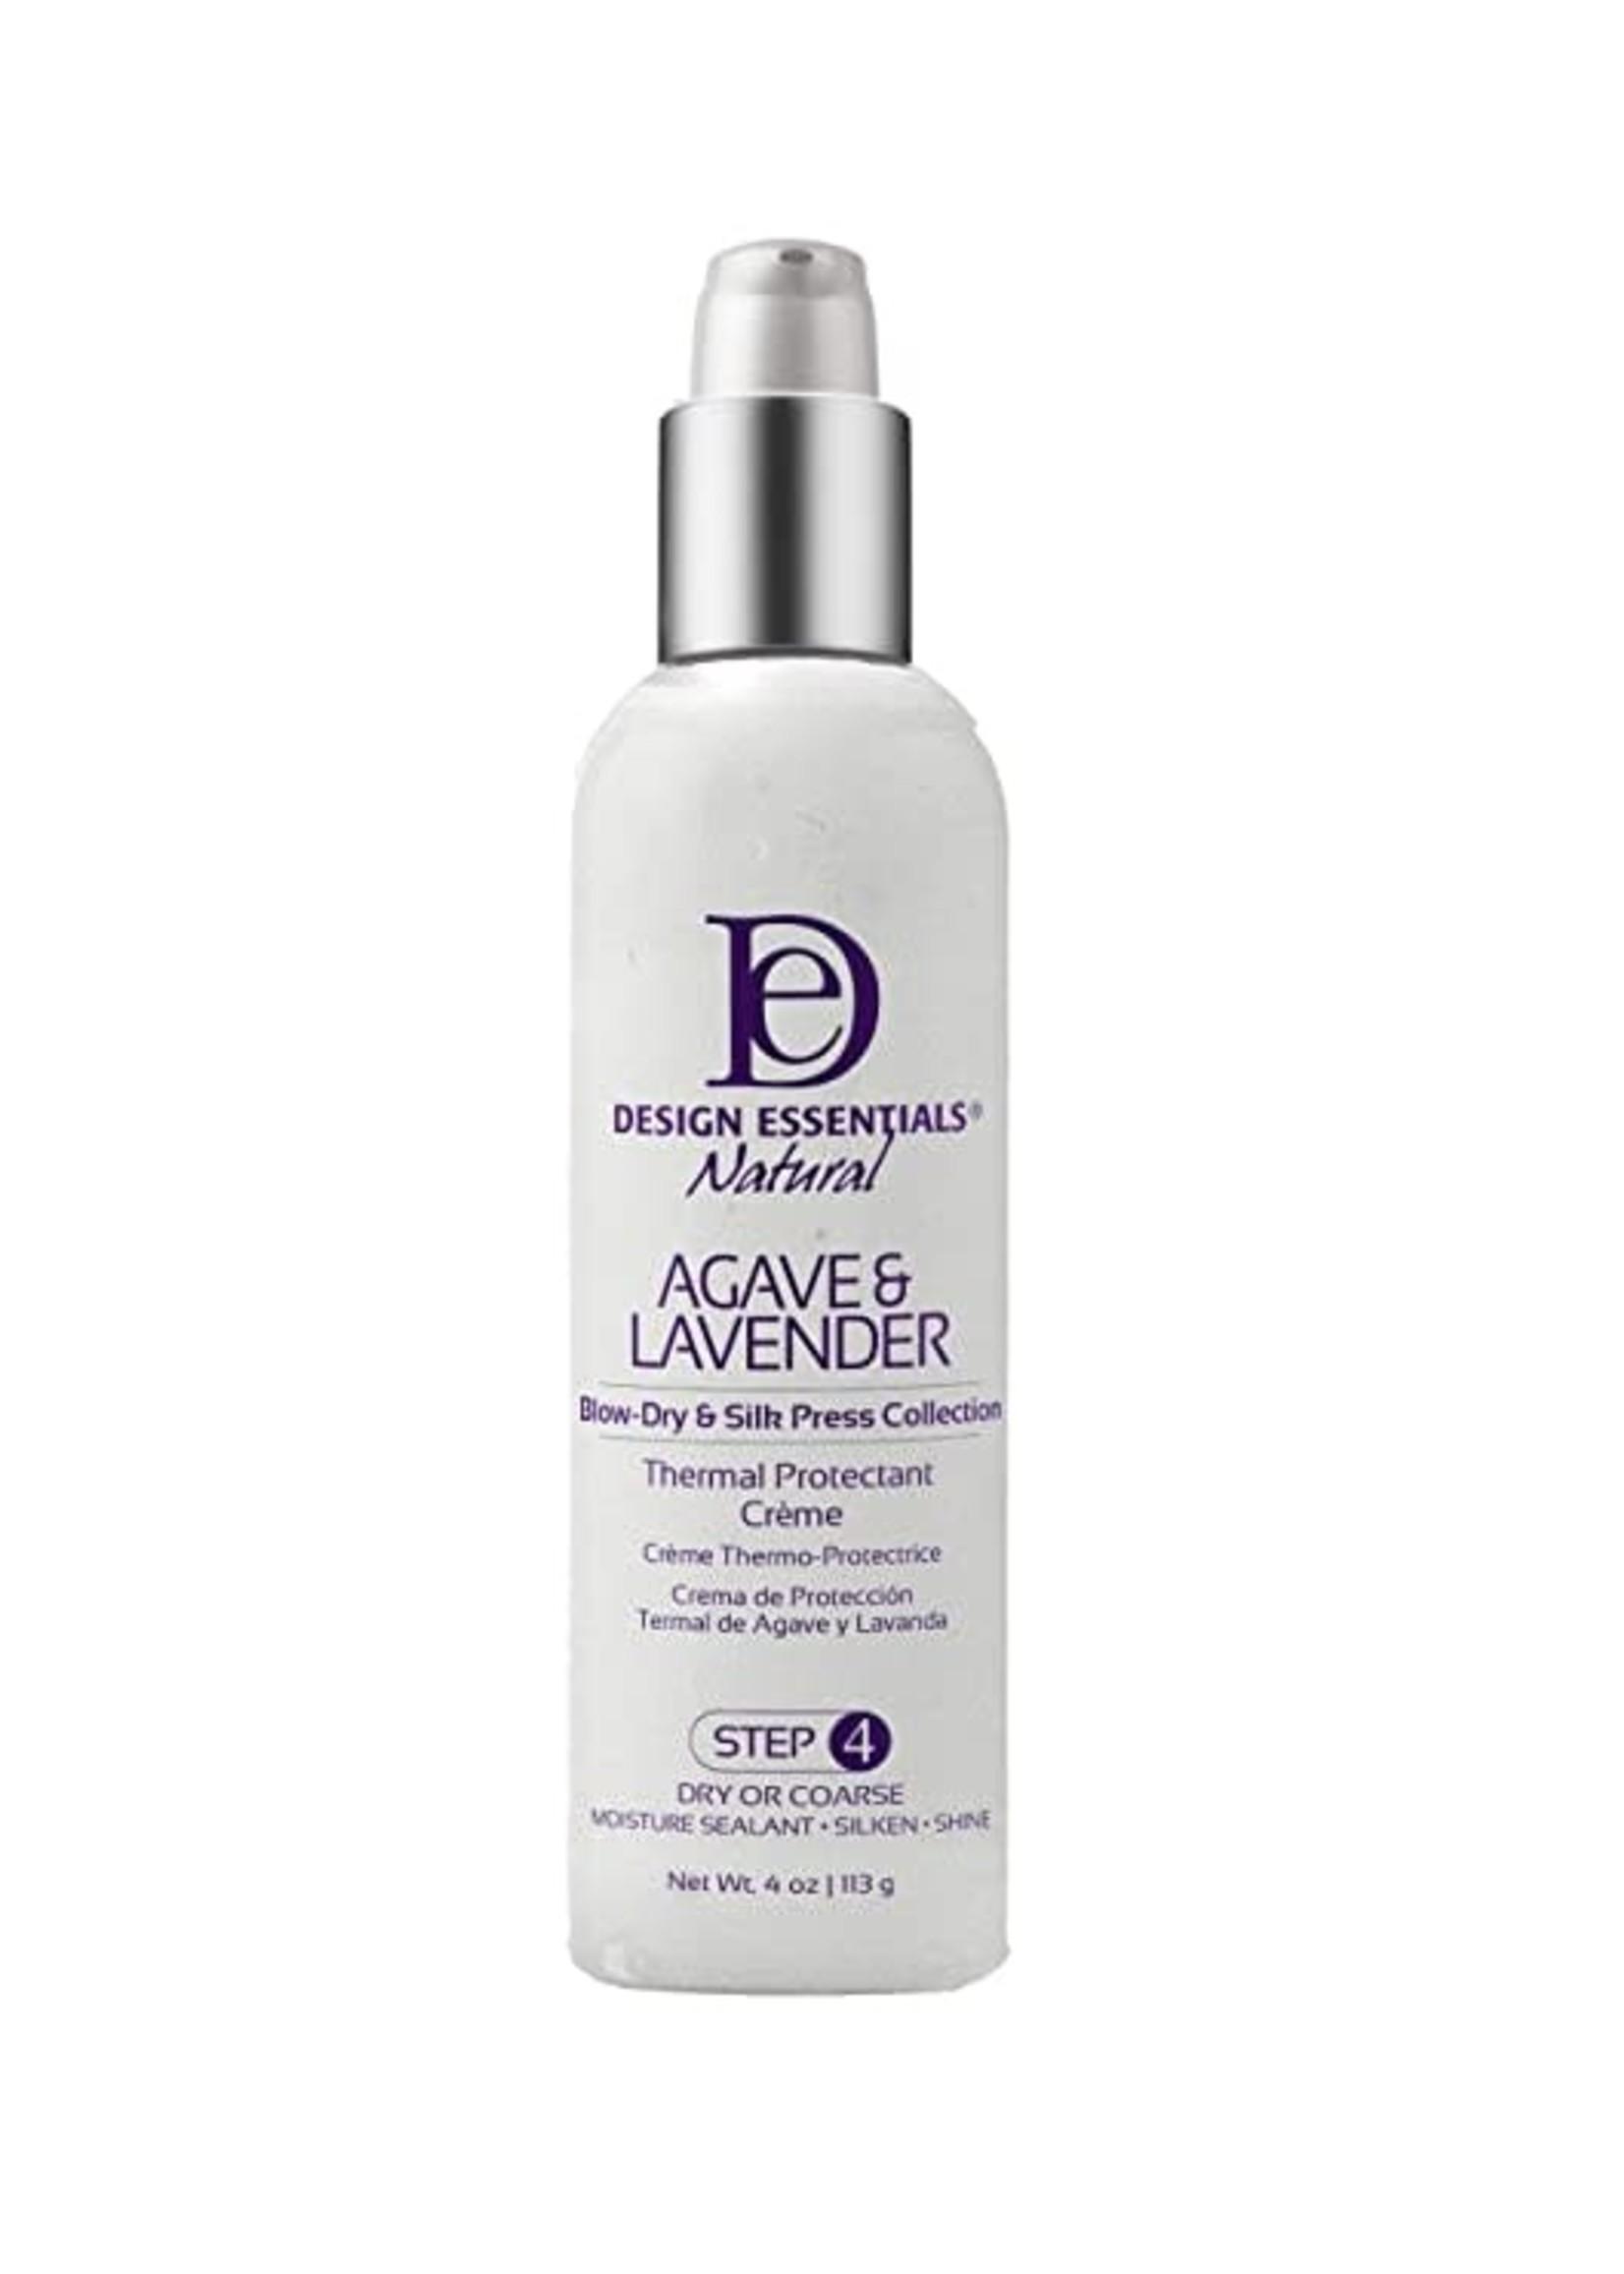 Design Essentials Agave & Lavender Thermal Protect Cream